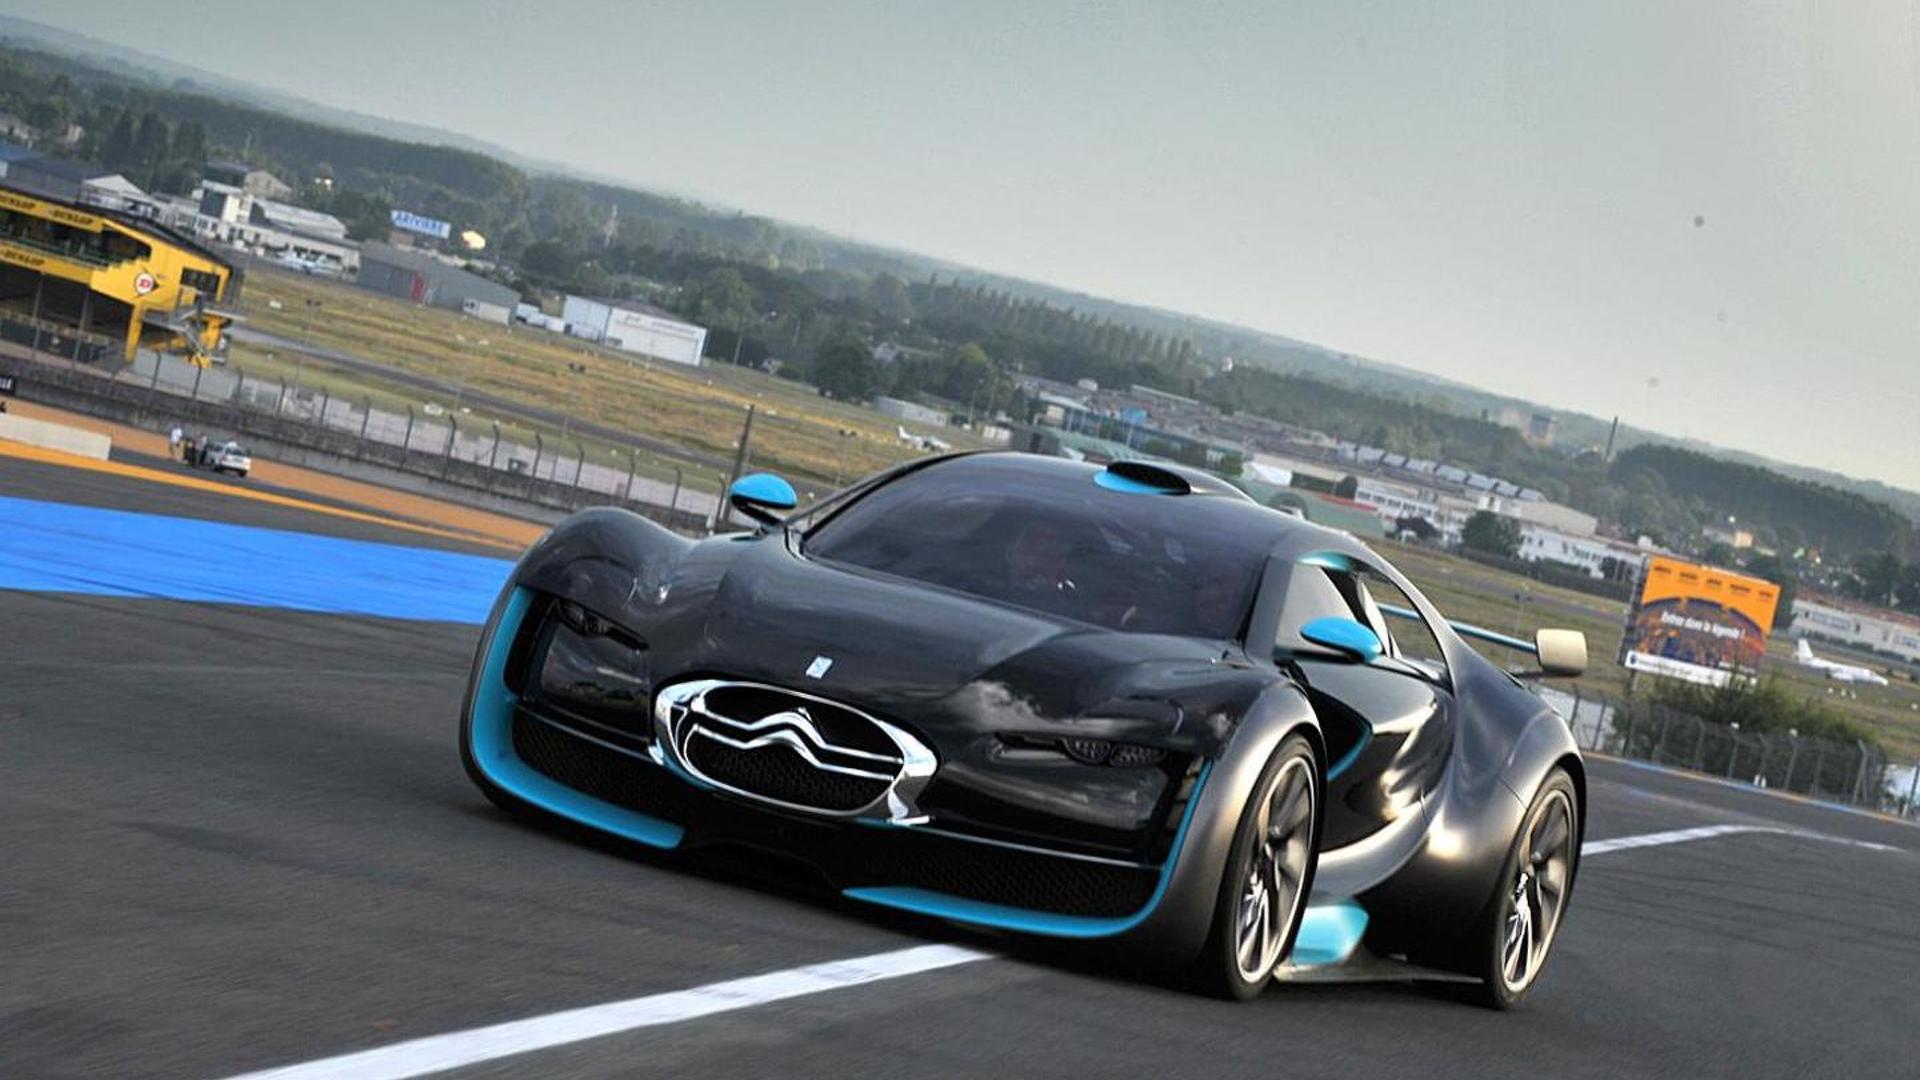 Citroen Survolt Metropolis Concepts Edge Close To Production